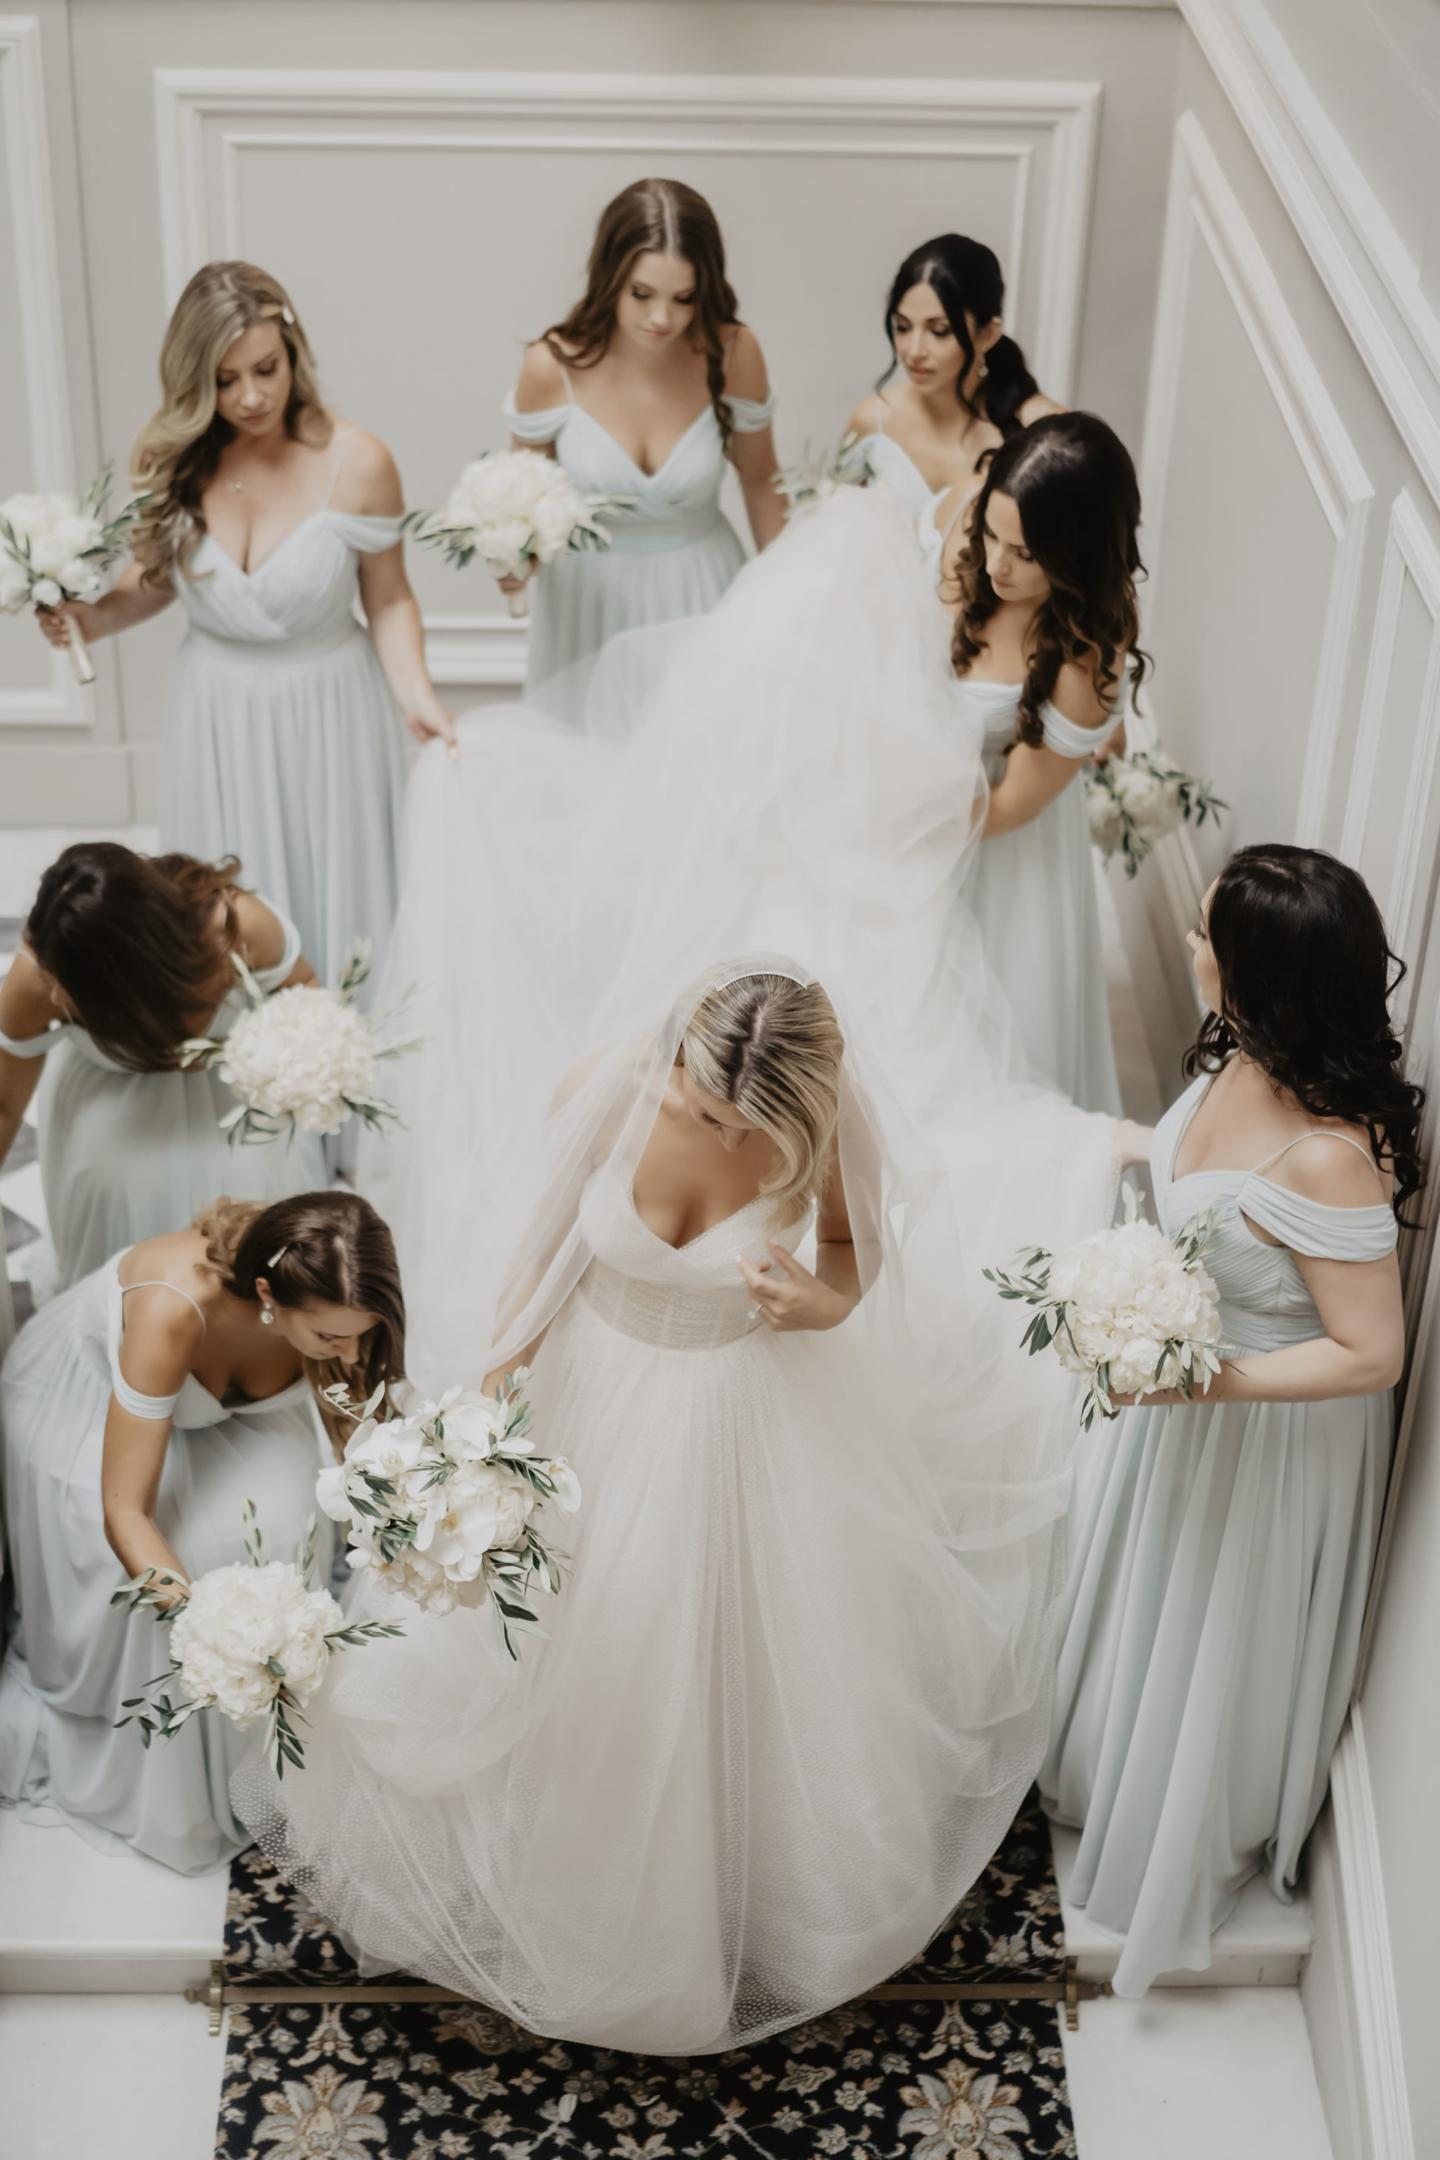 A sparkling wedding in the shore of the Arno - 23 :: A sparkling wedding on the shore of the Arno :: Luxury wedding photography - 22 :: A sparkling wedding in the shore of the Arno - 23